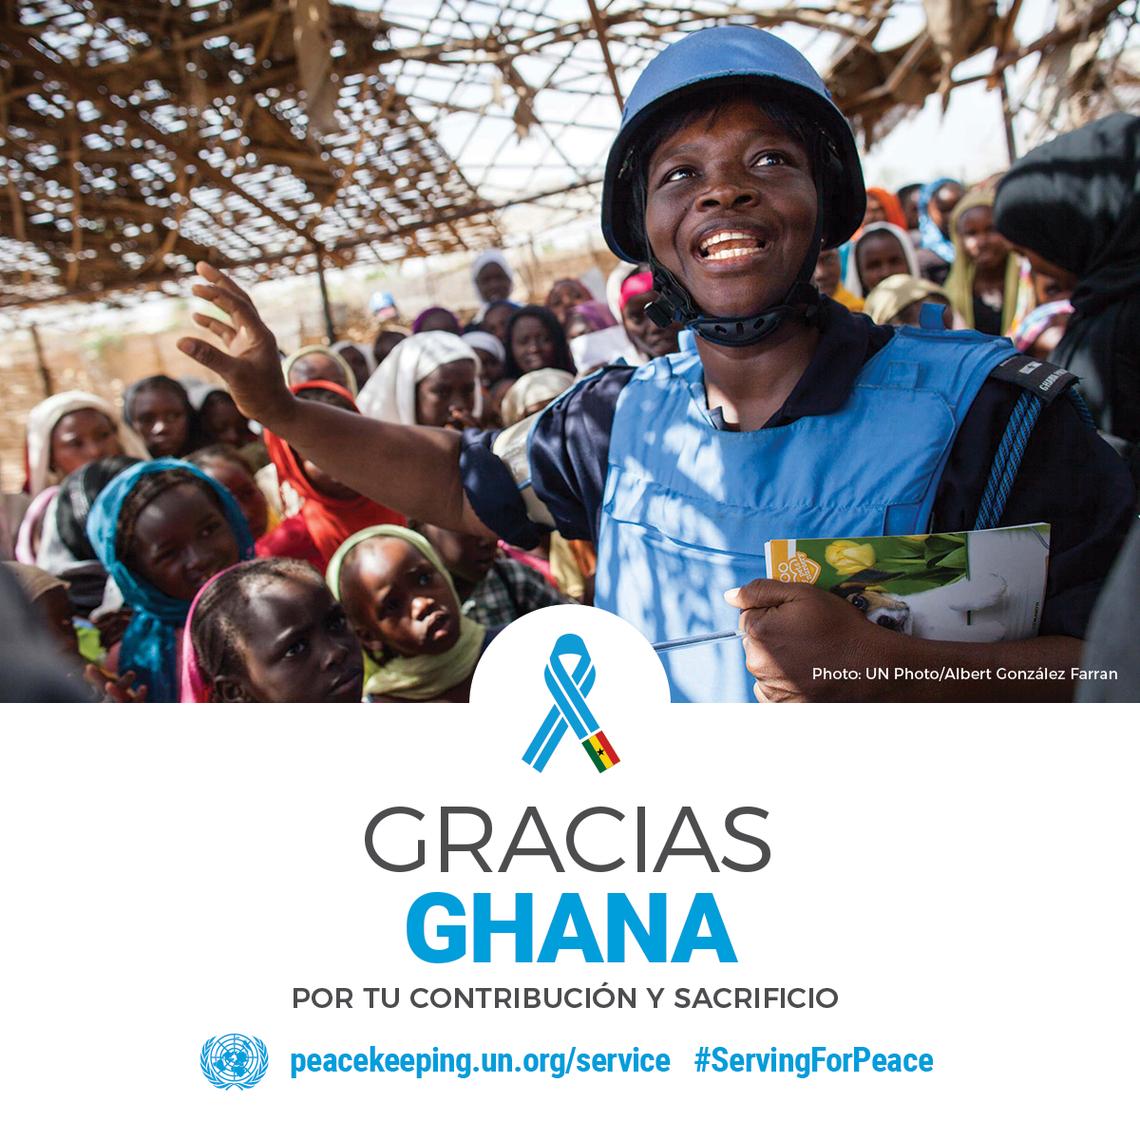 Personal de la Paz en Ghana